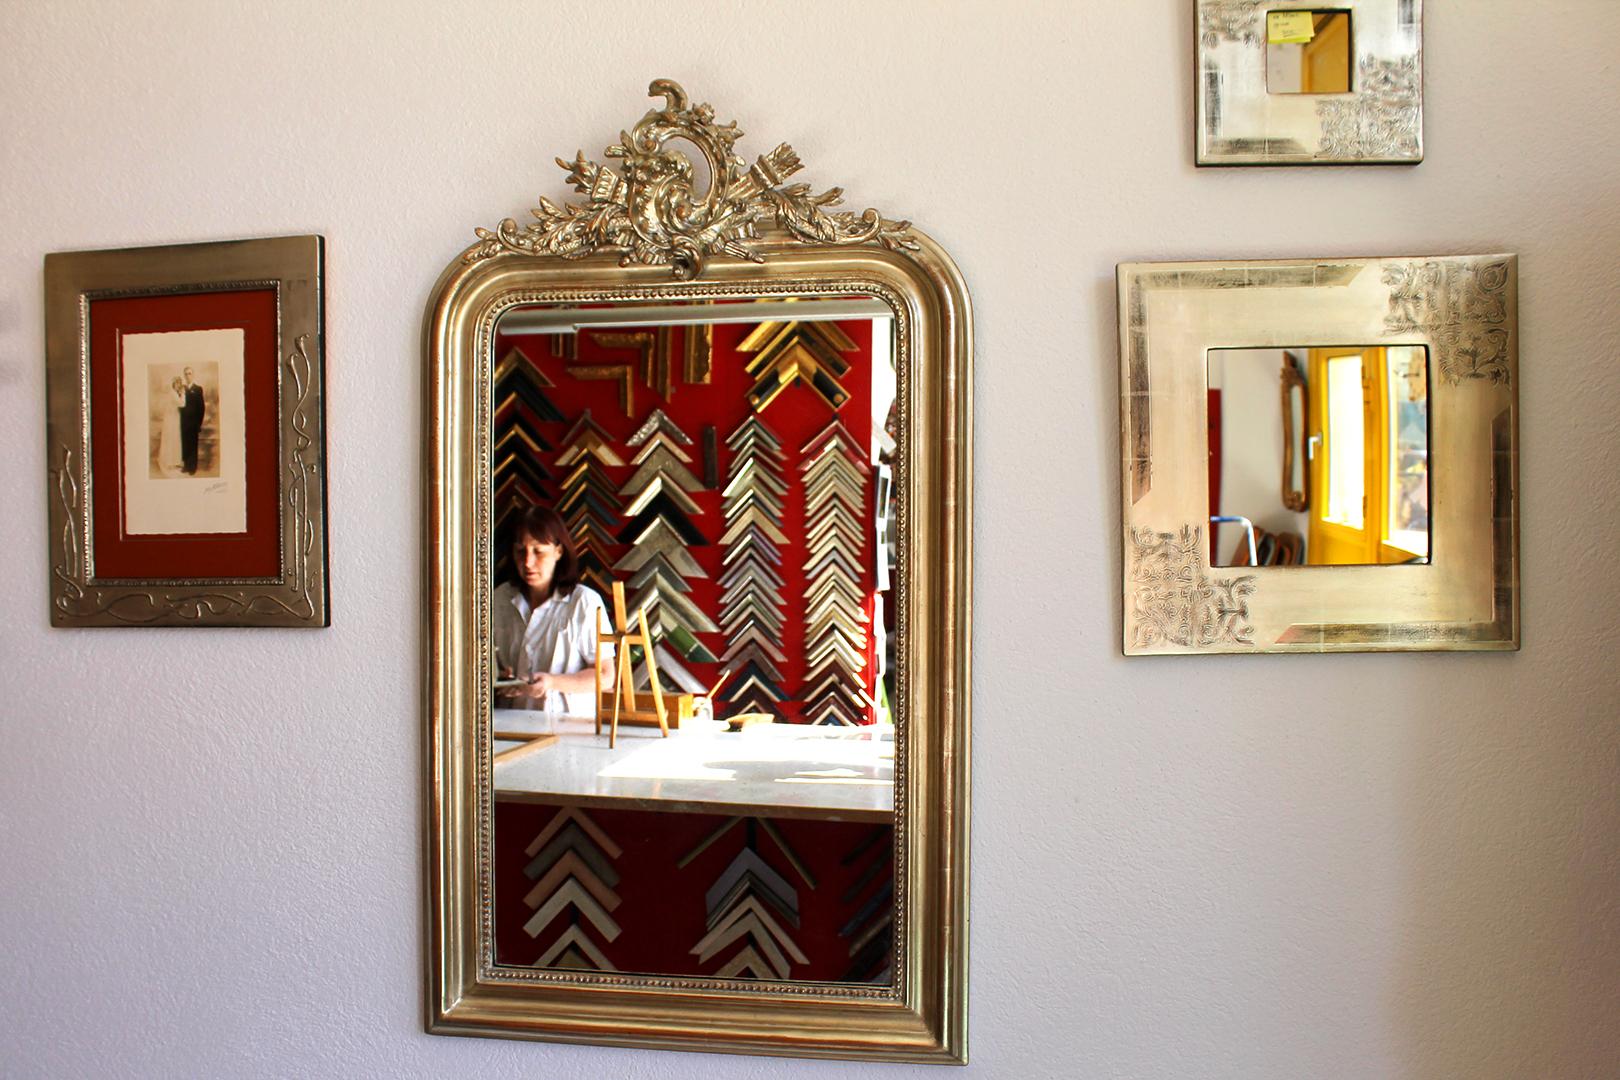 Miroirs cadres et Anouk Smetana